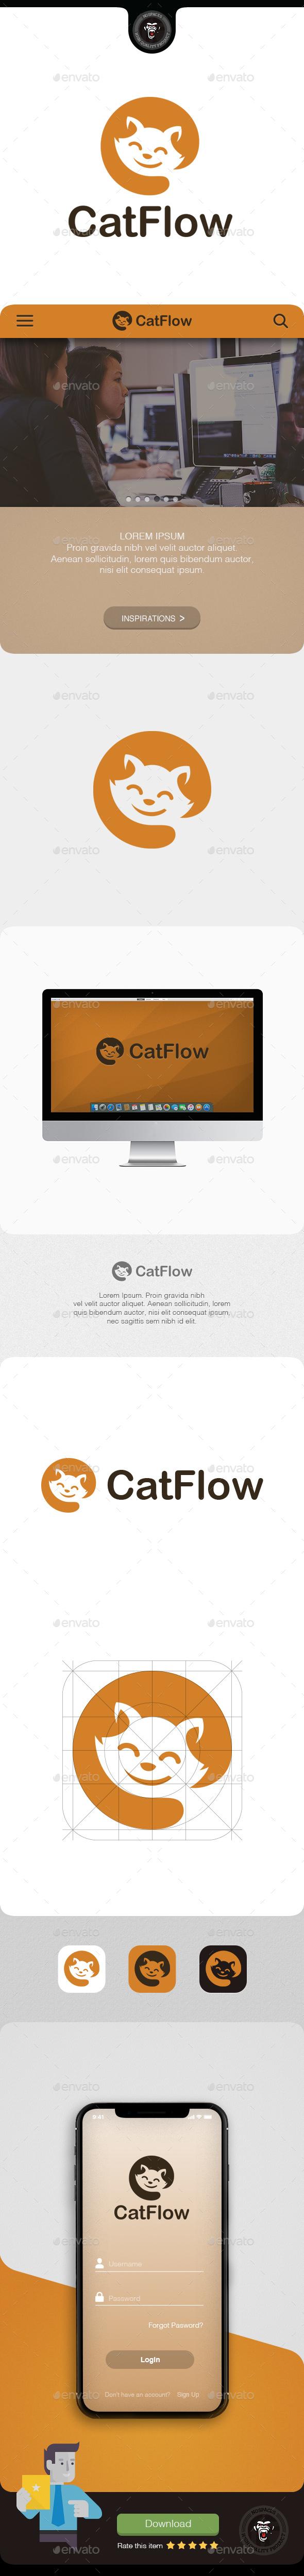 Catflow